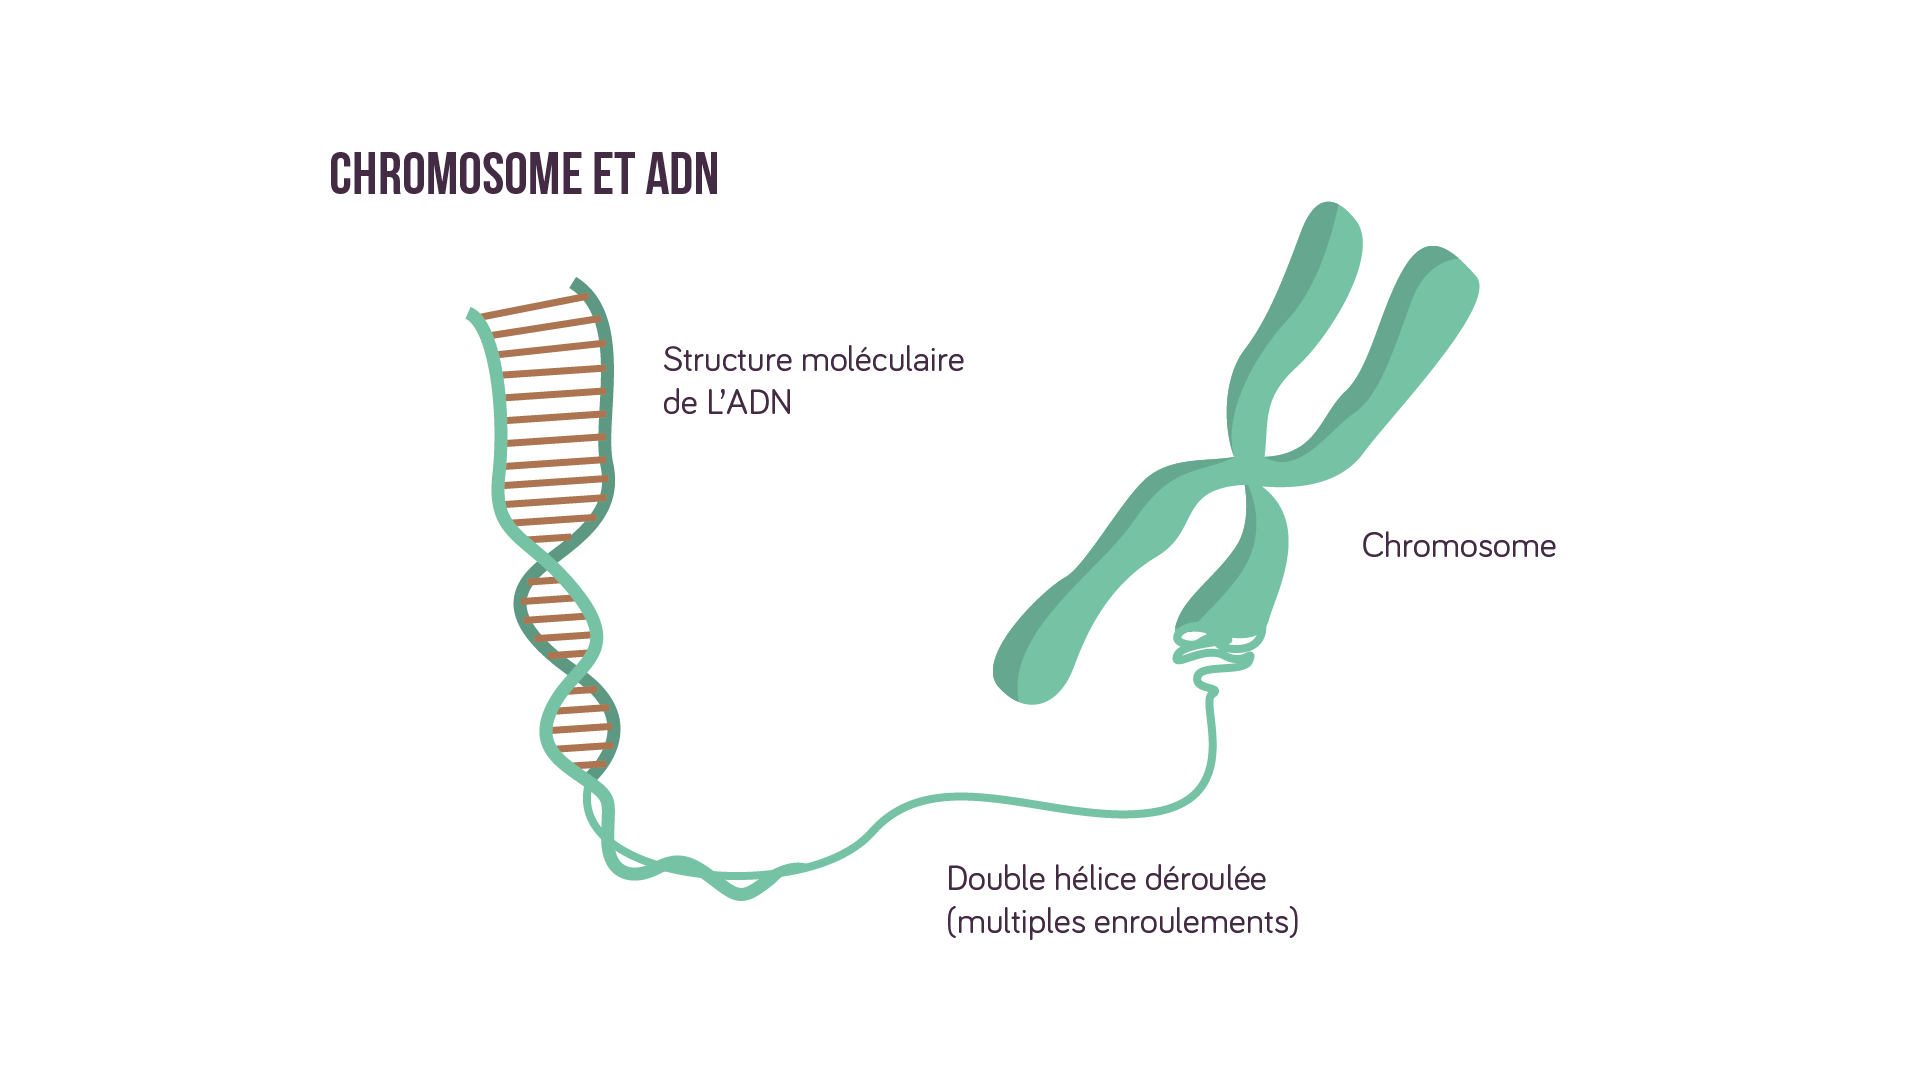 Chromosome et ADN